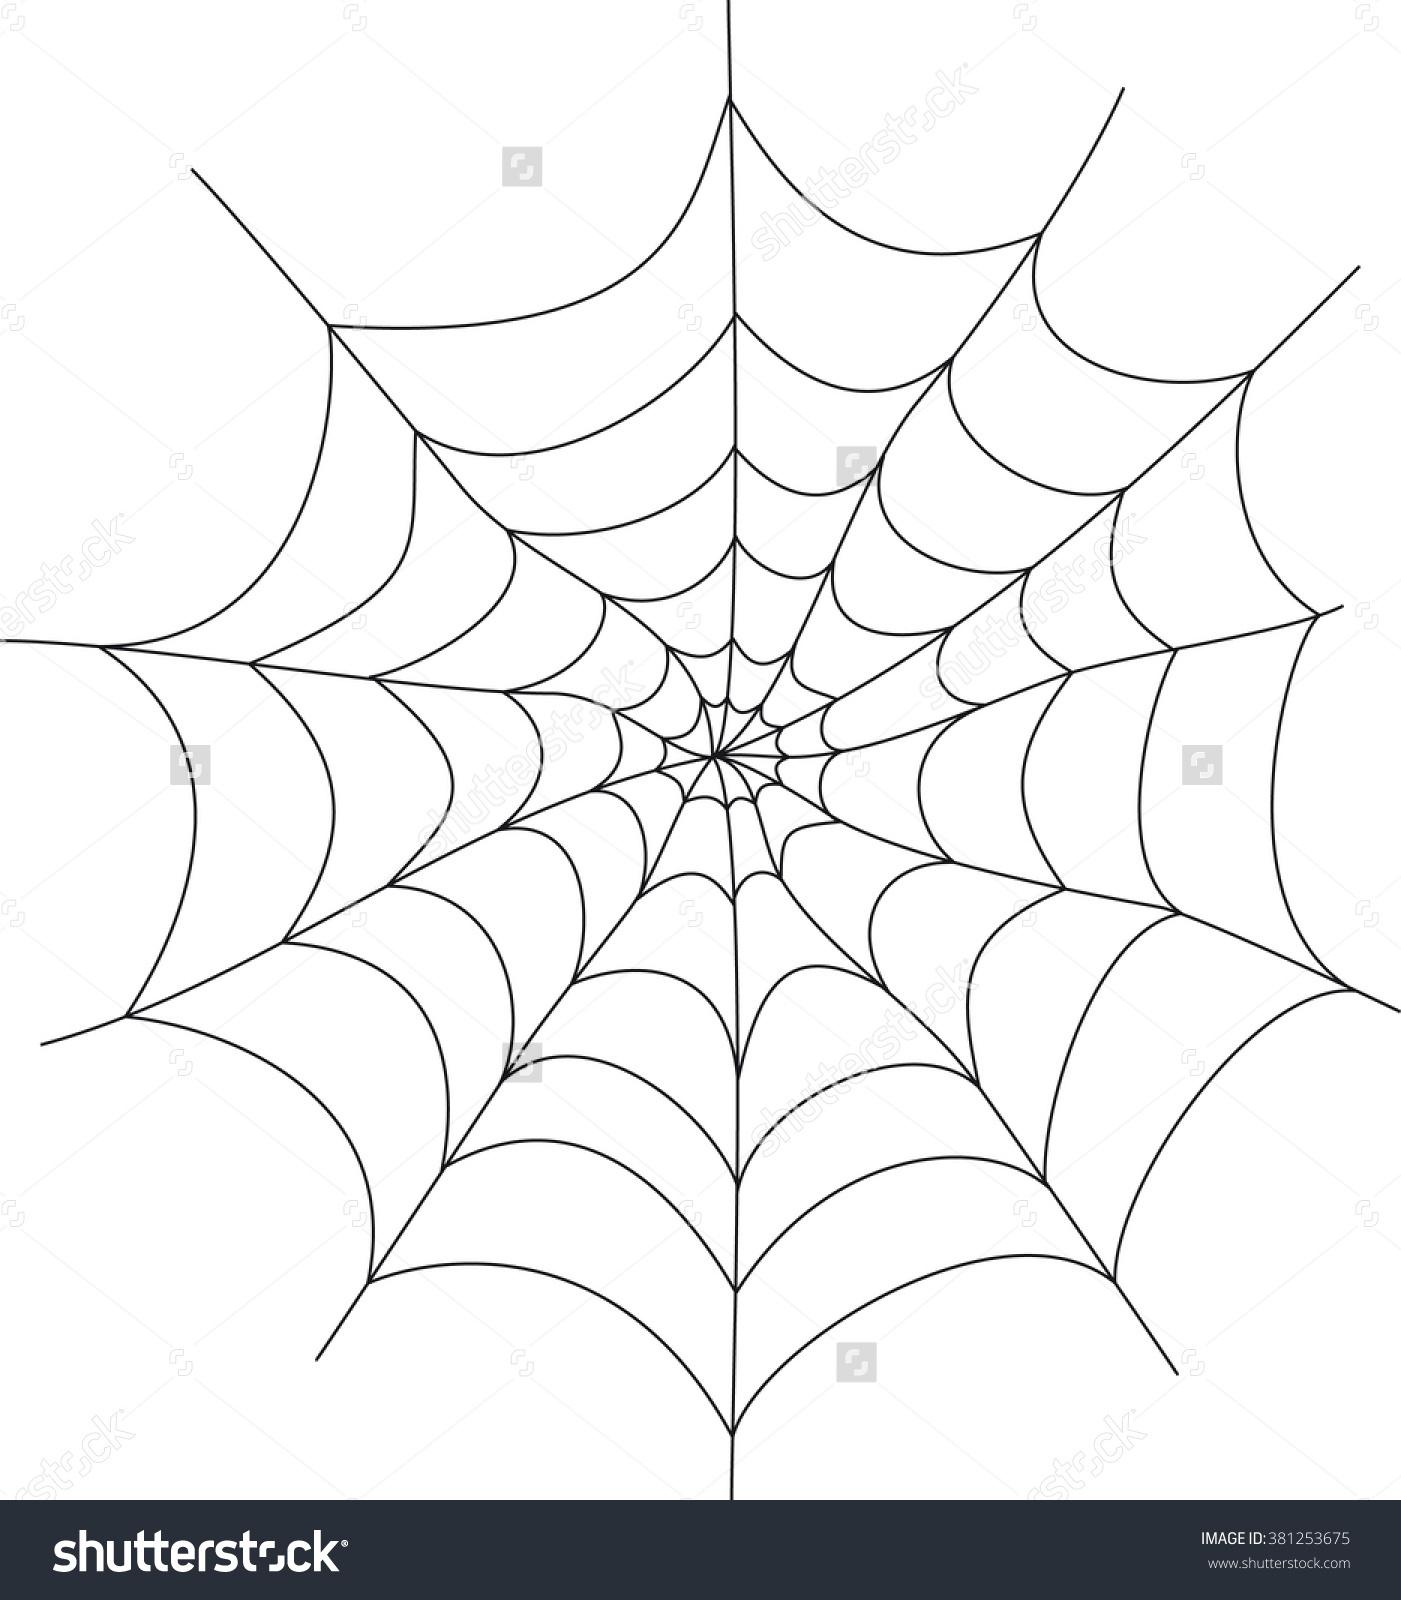 1401x1600 Spider Web Cartoon Drawing Isolated Spiderweb Trap Vector Cartoon